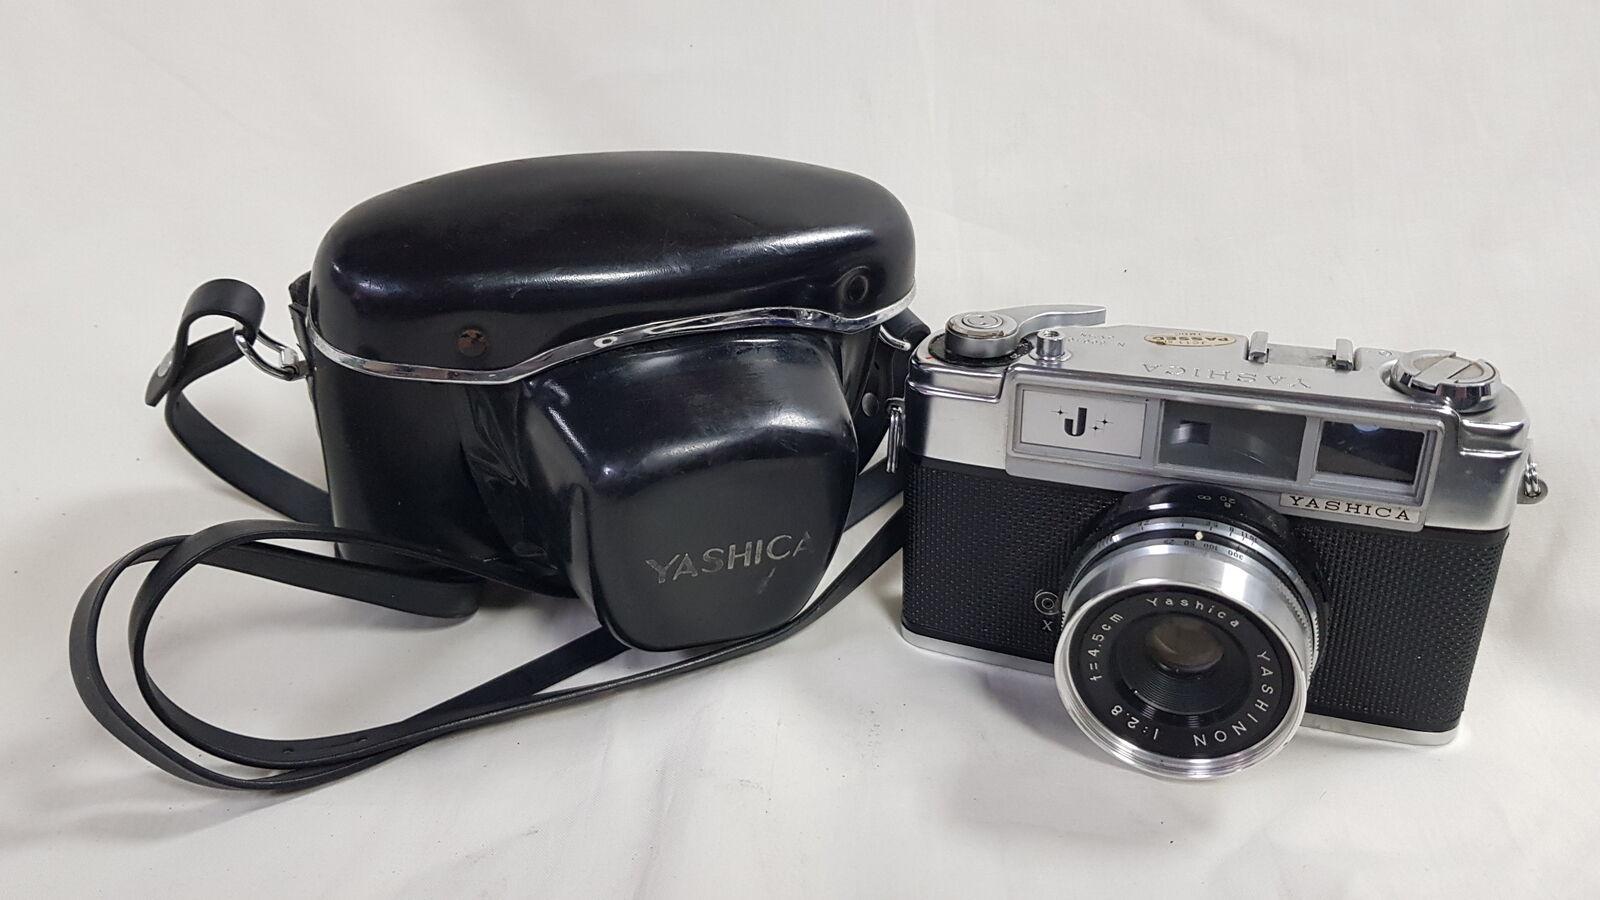 Rabatte Angebote Verkauf Yashica J Vintage Film Kamera mit Objektiv & Fall  nur USA Großhandelsrabatt online -engie-elektromontaz.pl